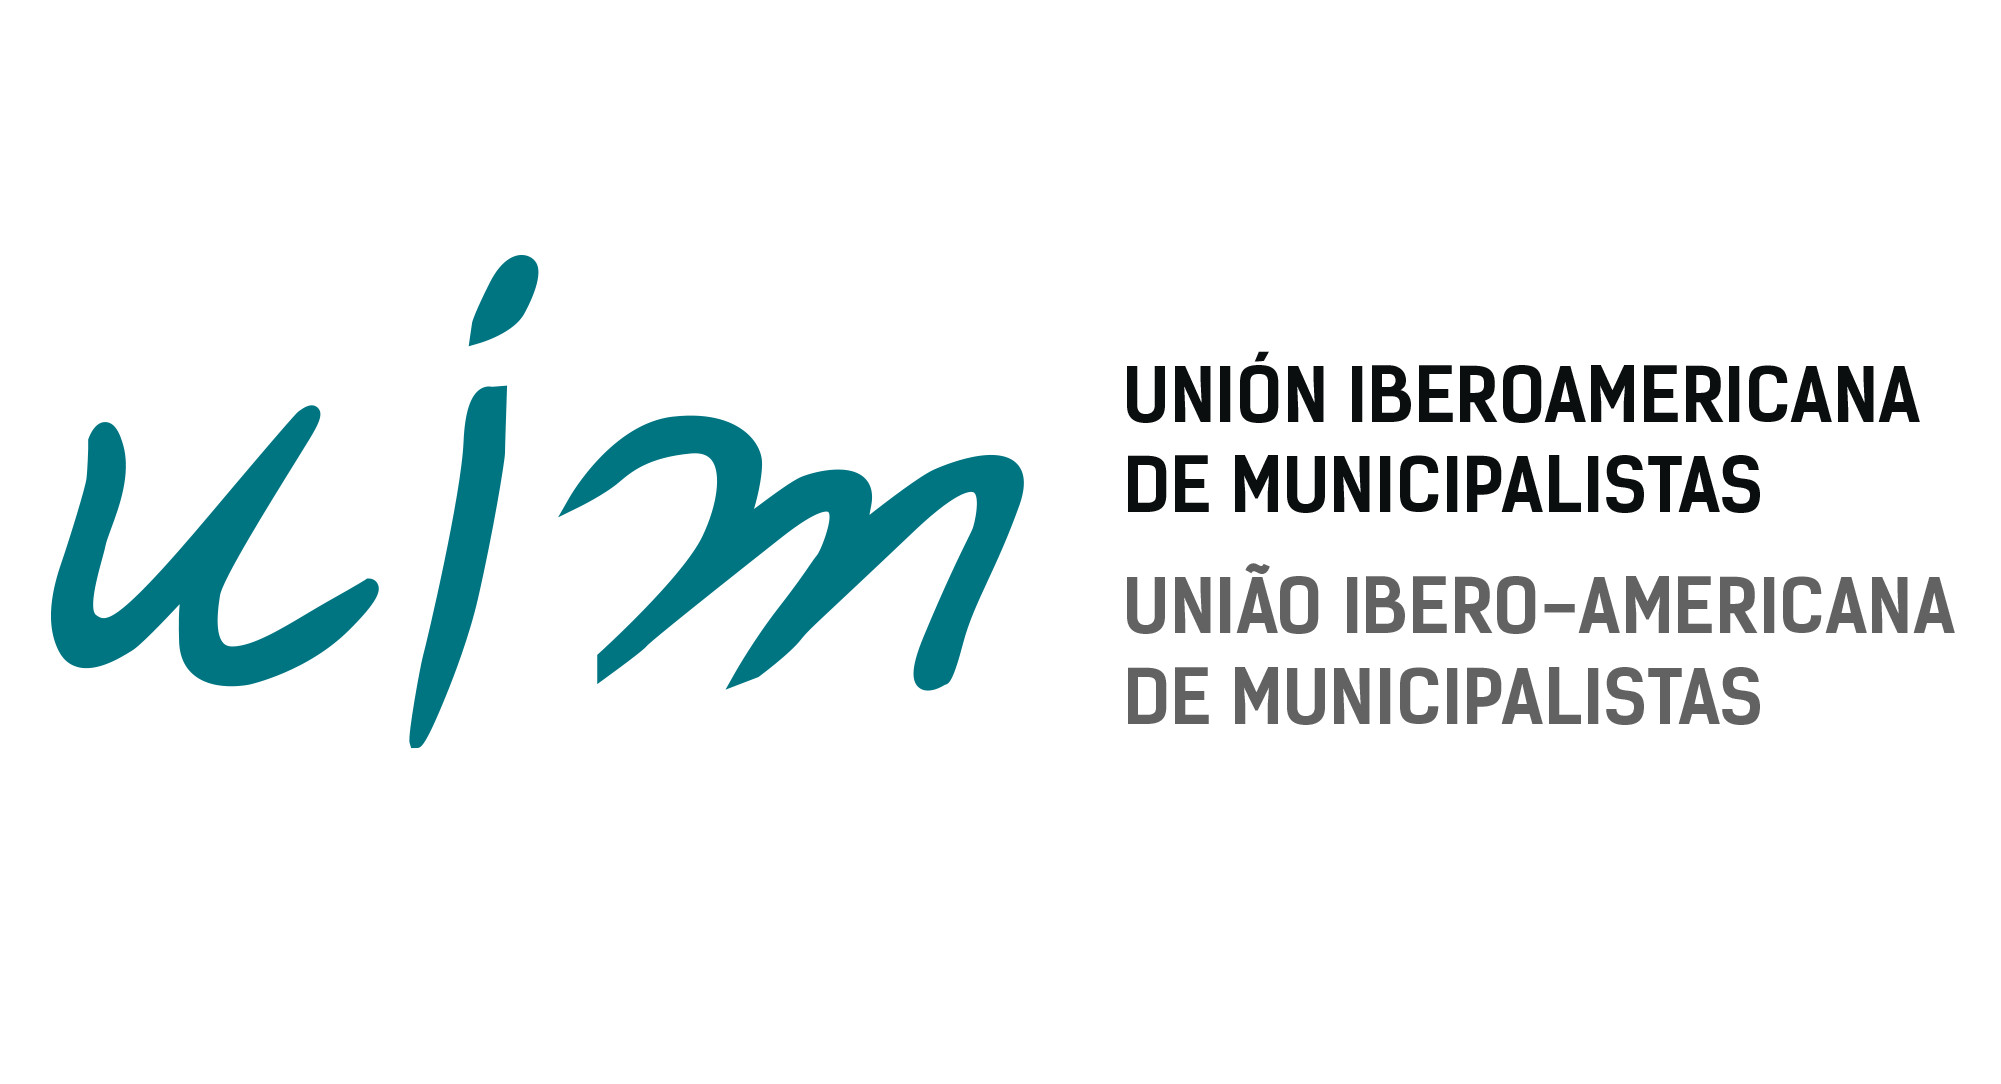 Unión Iberoamericana de Municipalistas (UIM)